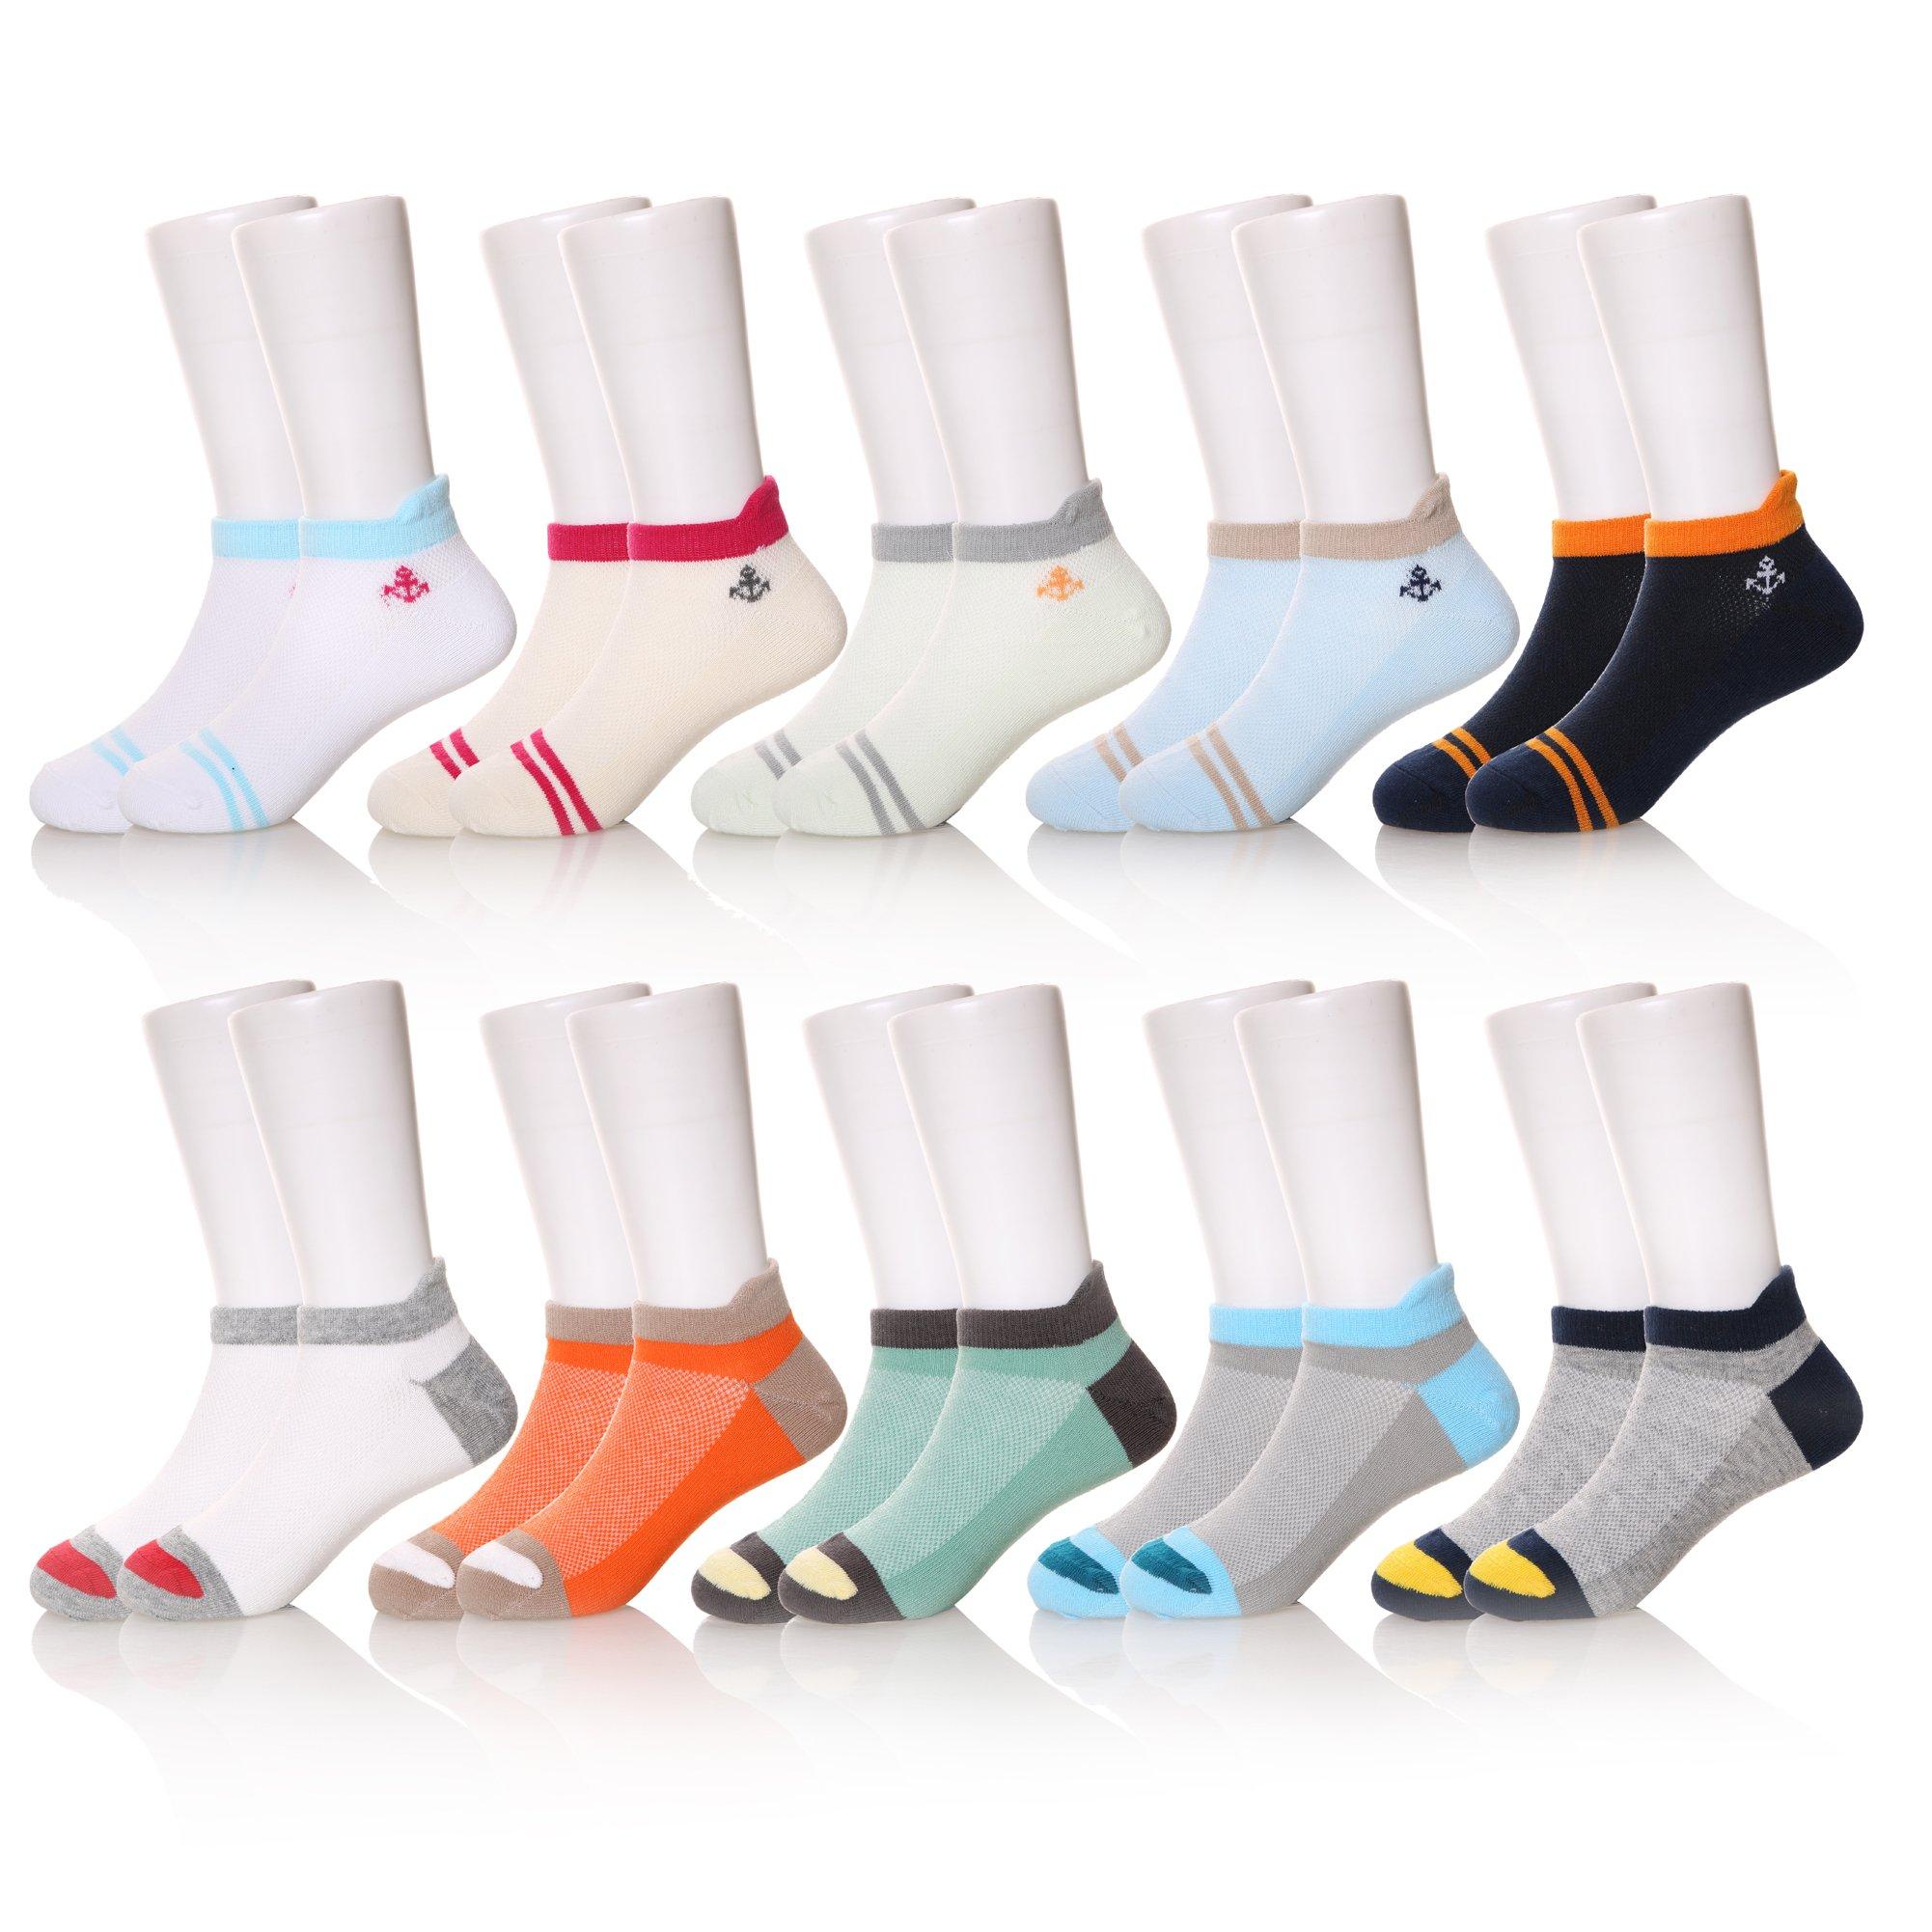 10 Pairs Boys' Low Cut Athletic Socks (10 Pairs, 1-3 Years)